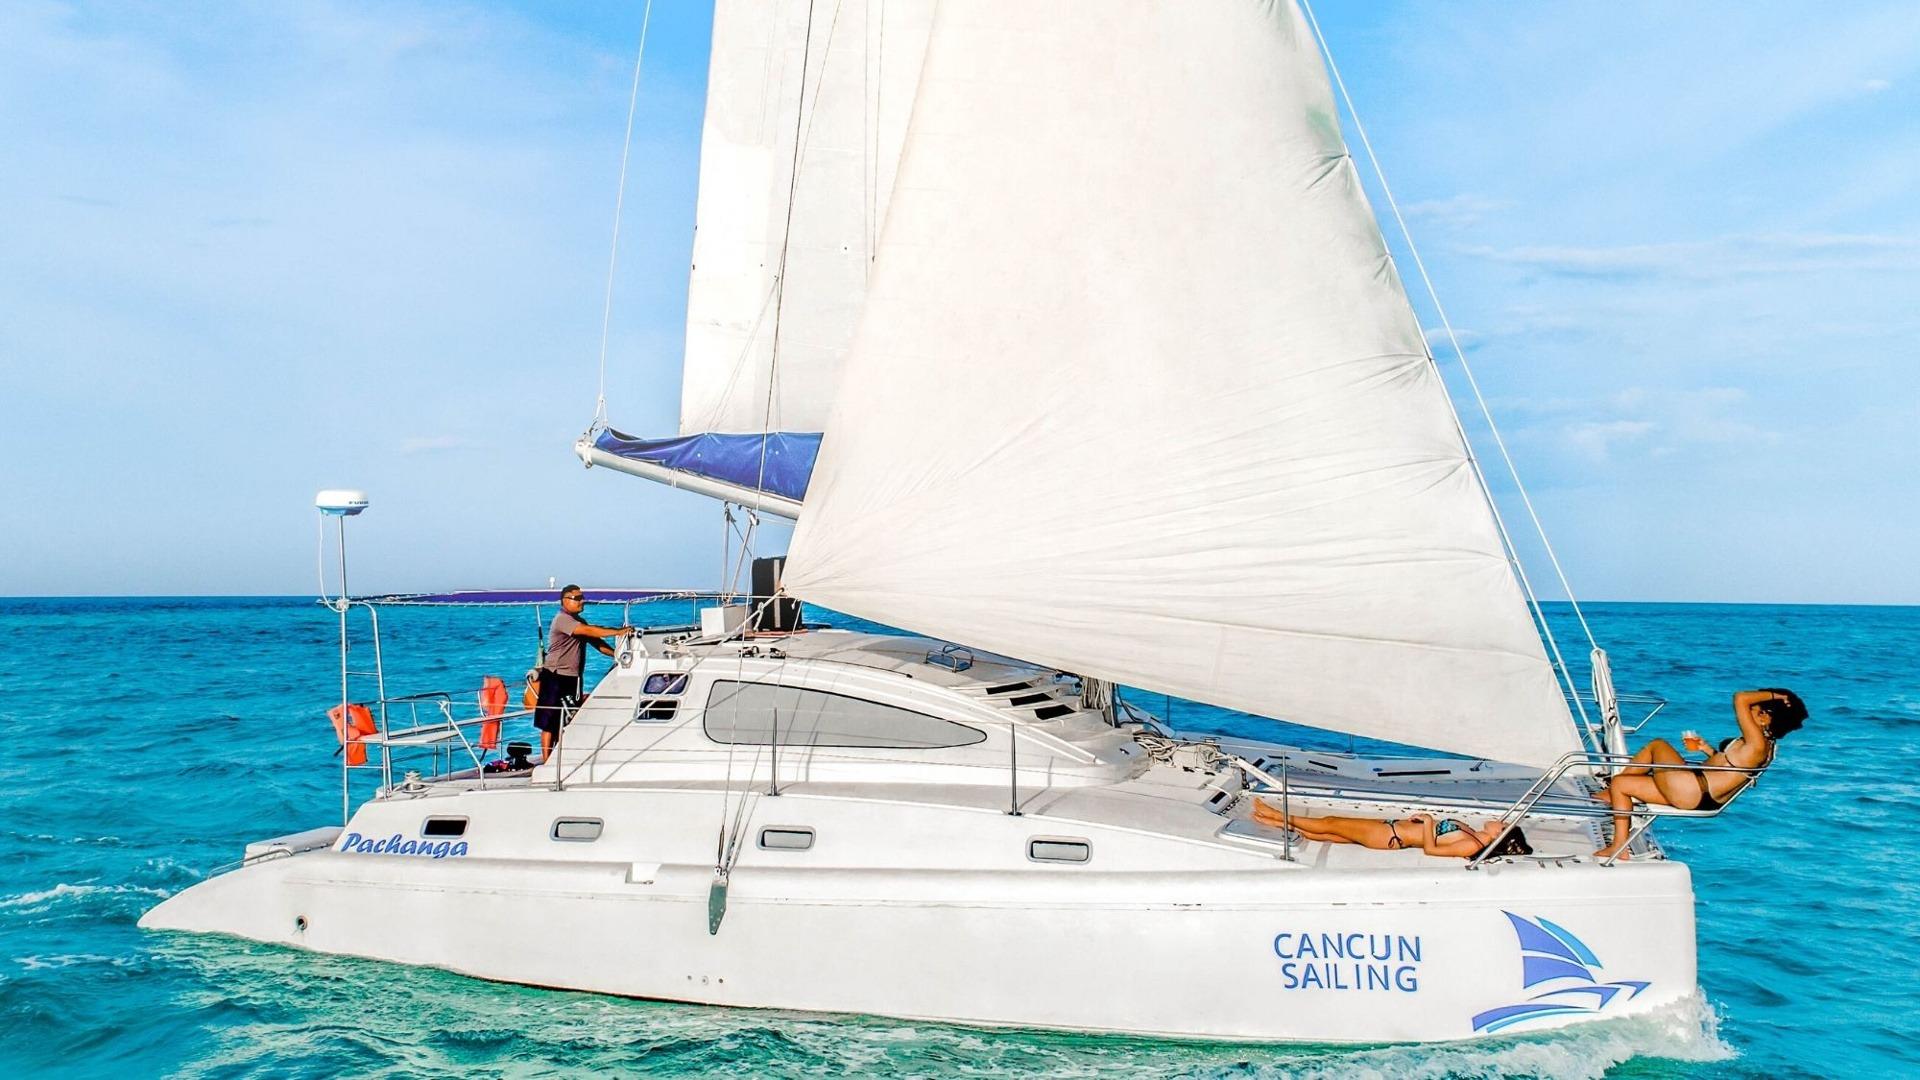 1 - LowRes - Pachanga - Private Isla Mujeres catamaran tour - Cancun Sailing